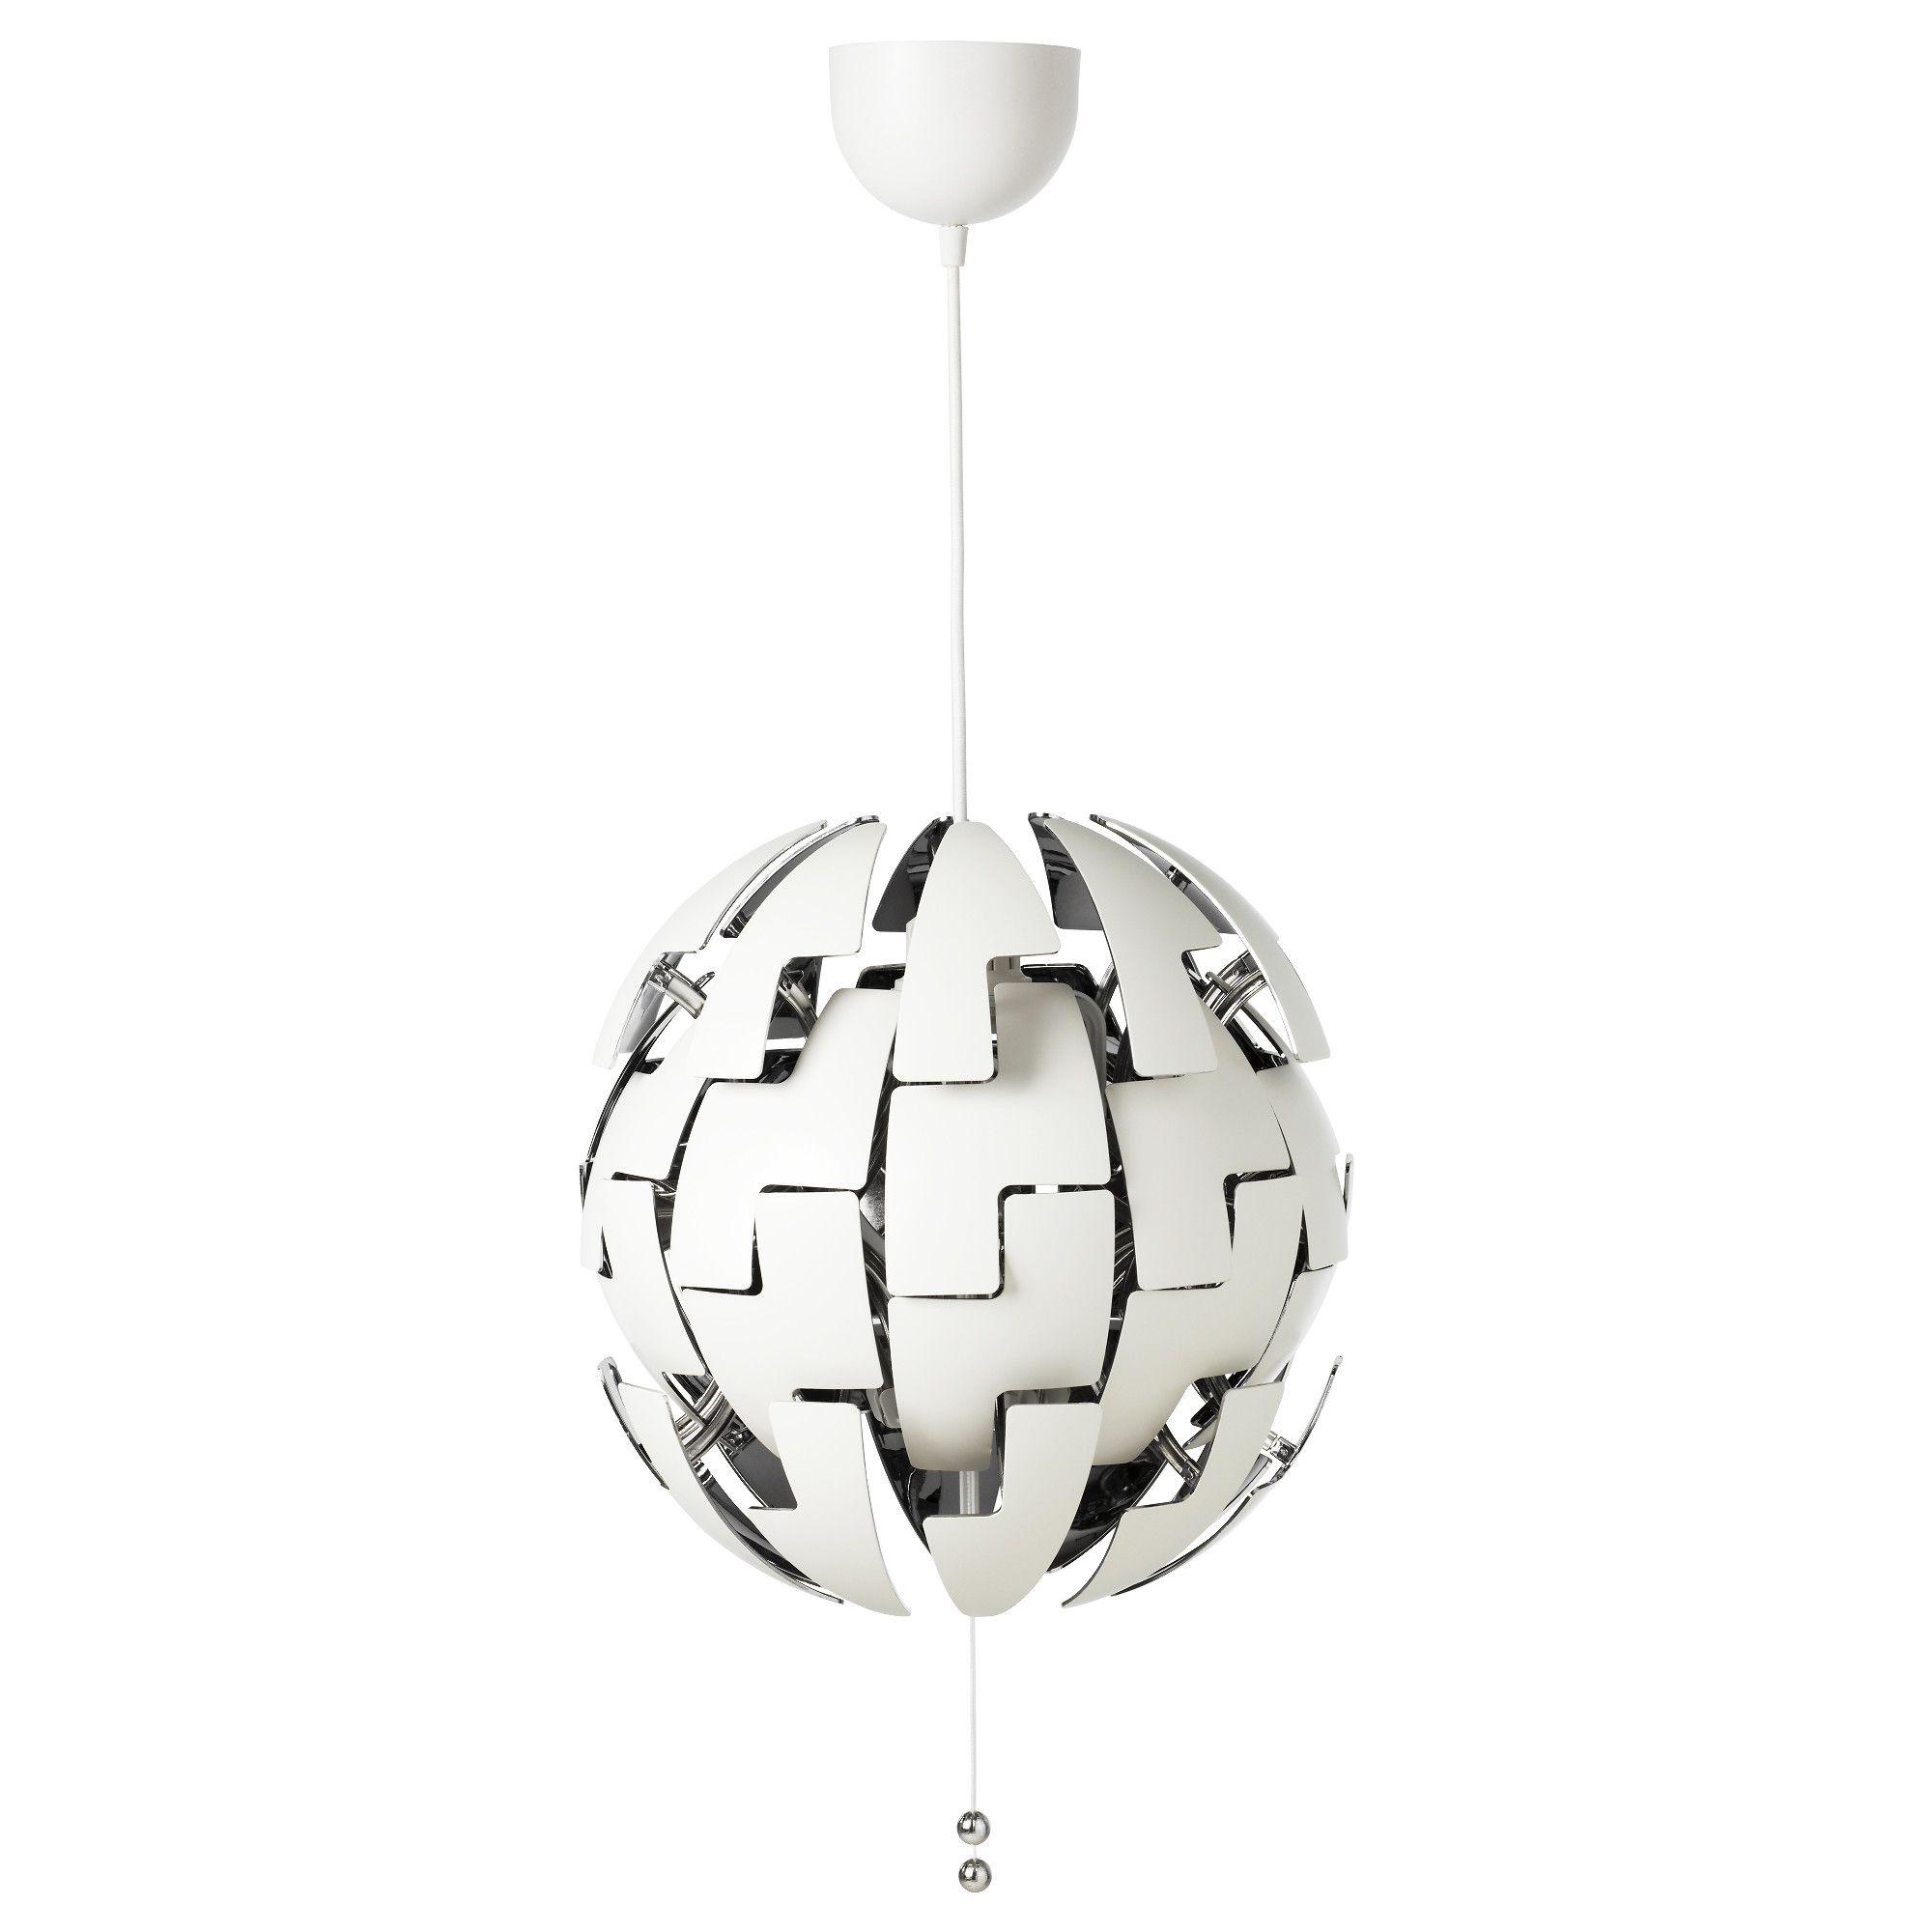 ikea lighting catalogue. IKEA - PS 2014, Pendant Lamp, White/silver Color, , You Can Easily Switch\u2026 Ikea Lighting Catalogue